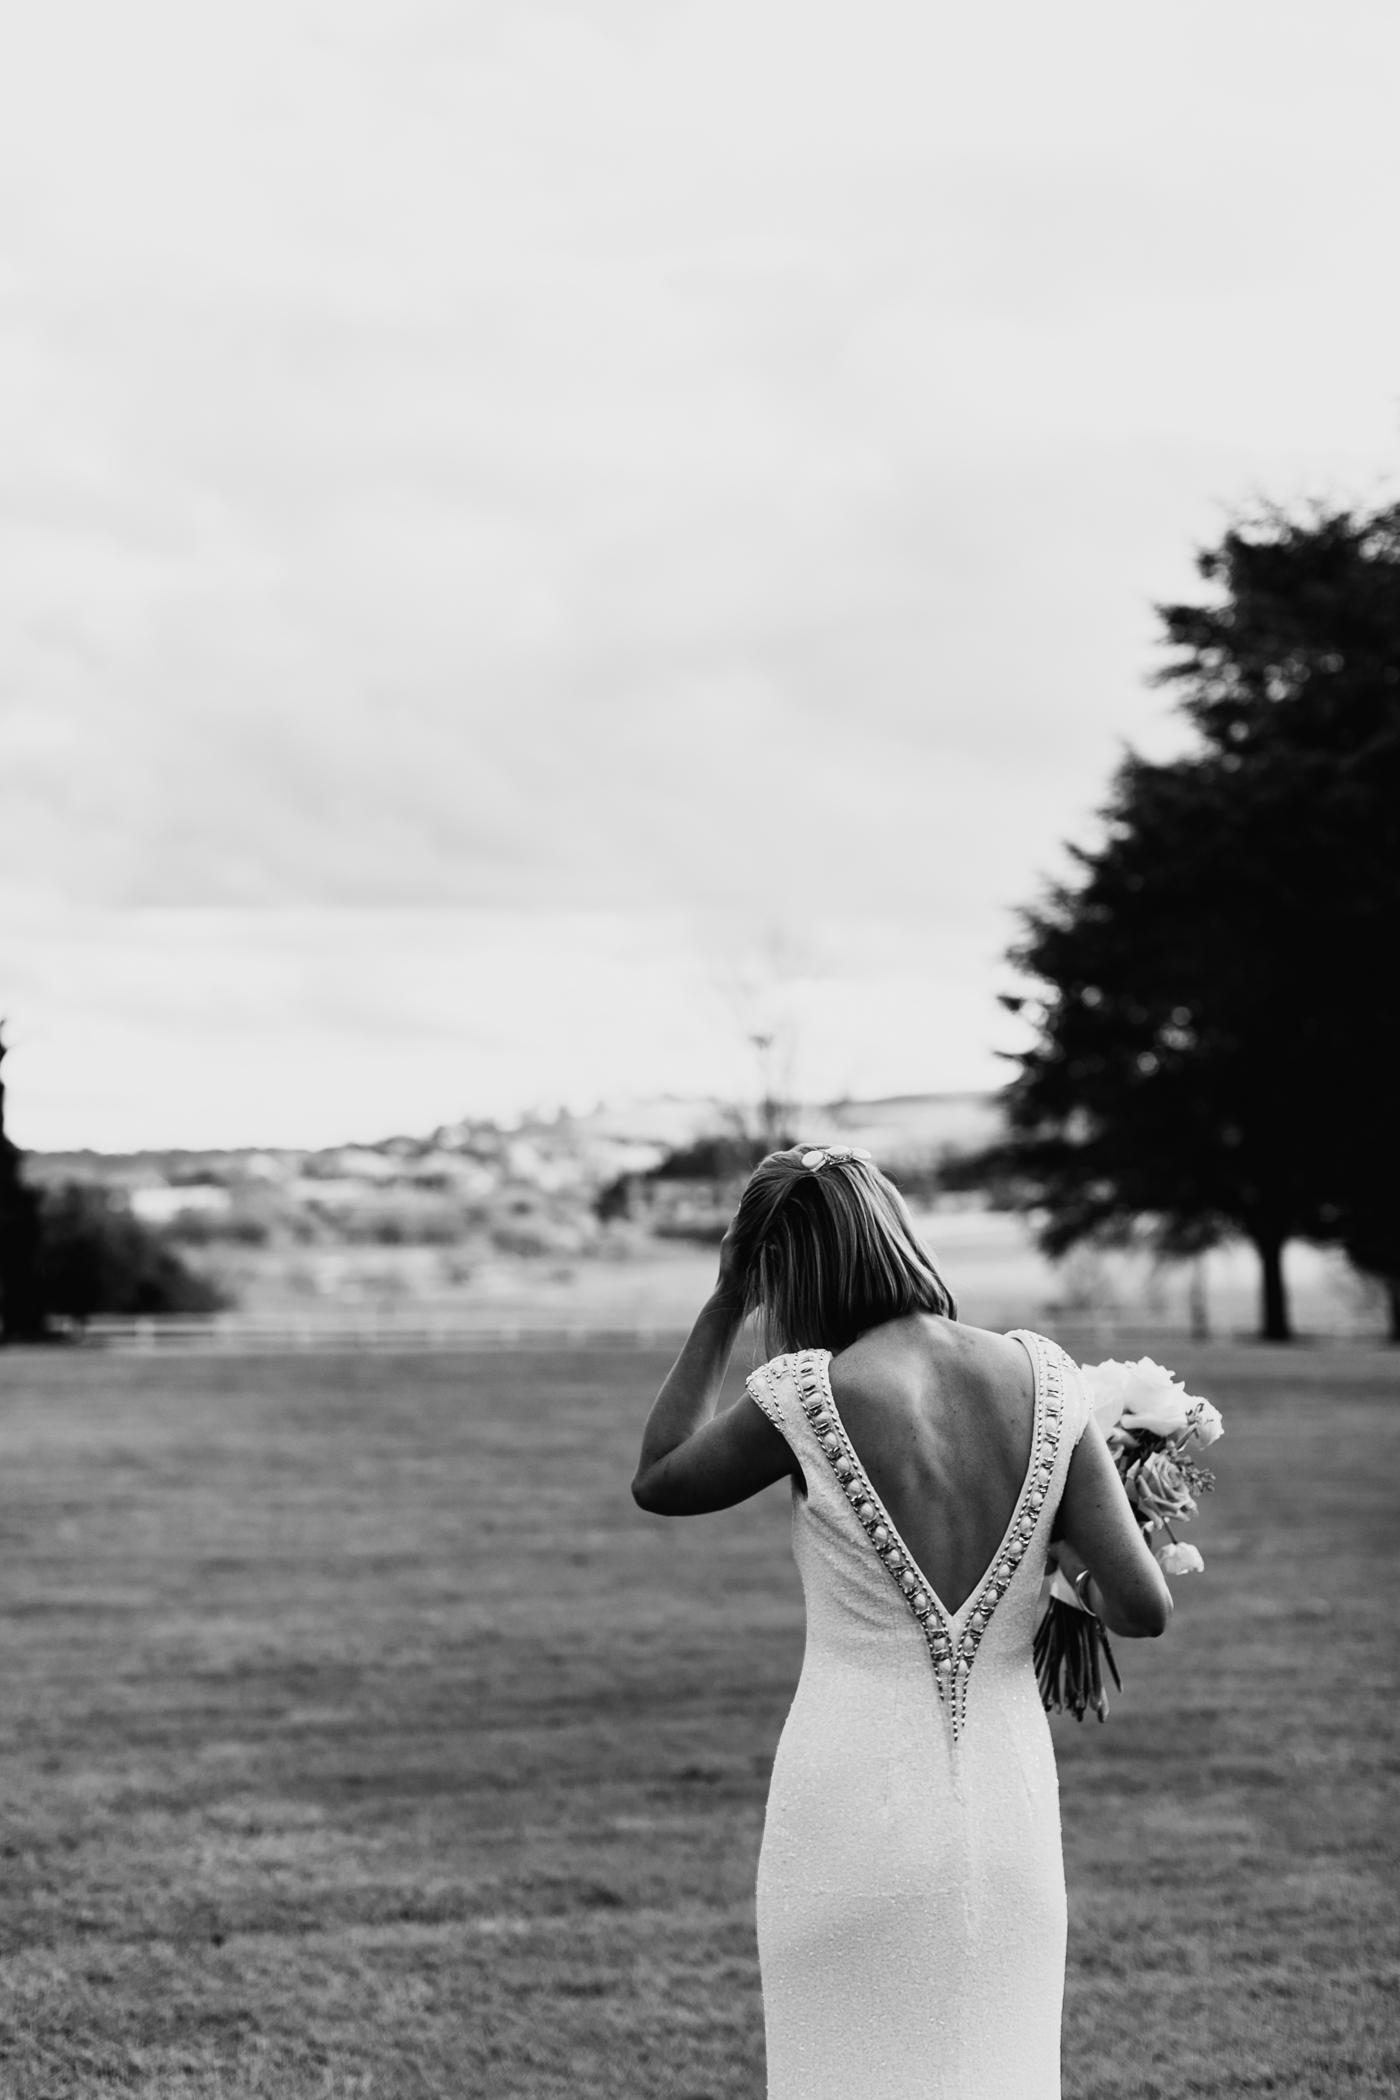 Bridget & James - Orange Country Wedding - Samantha Heather Photography-146.jpg